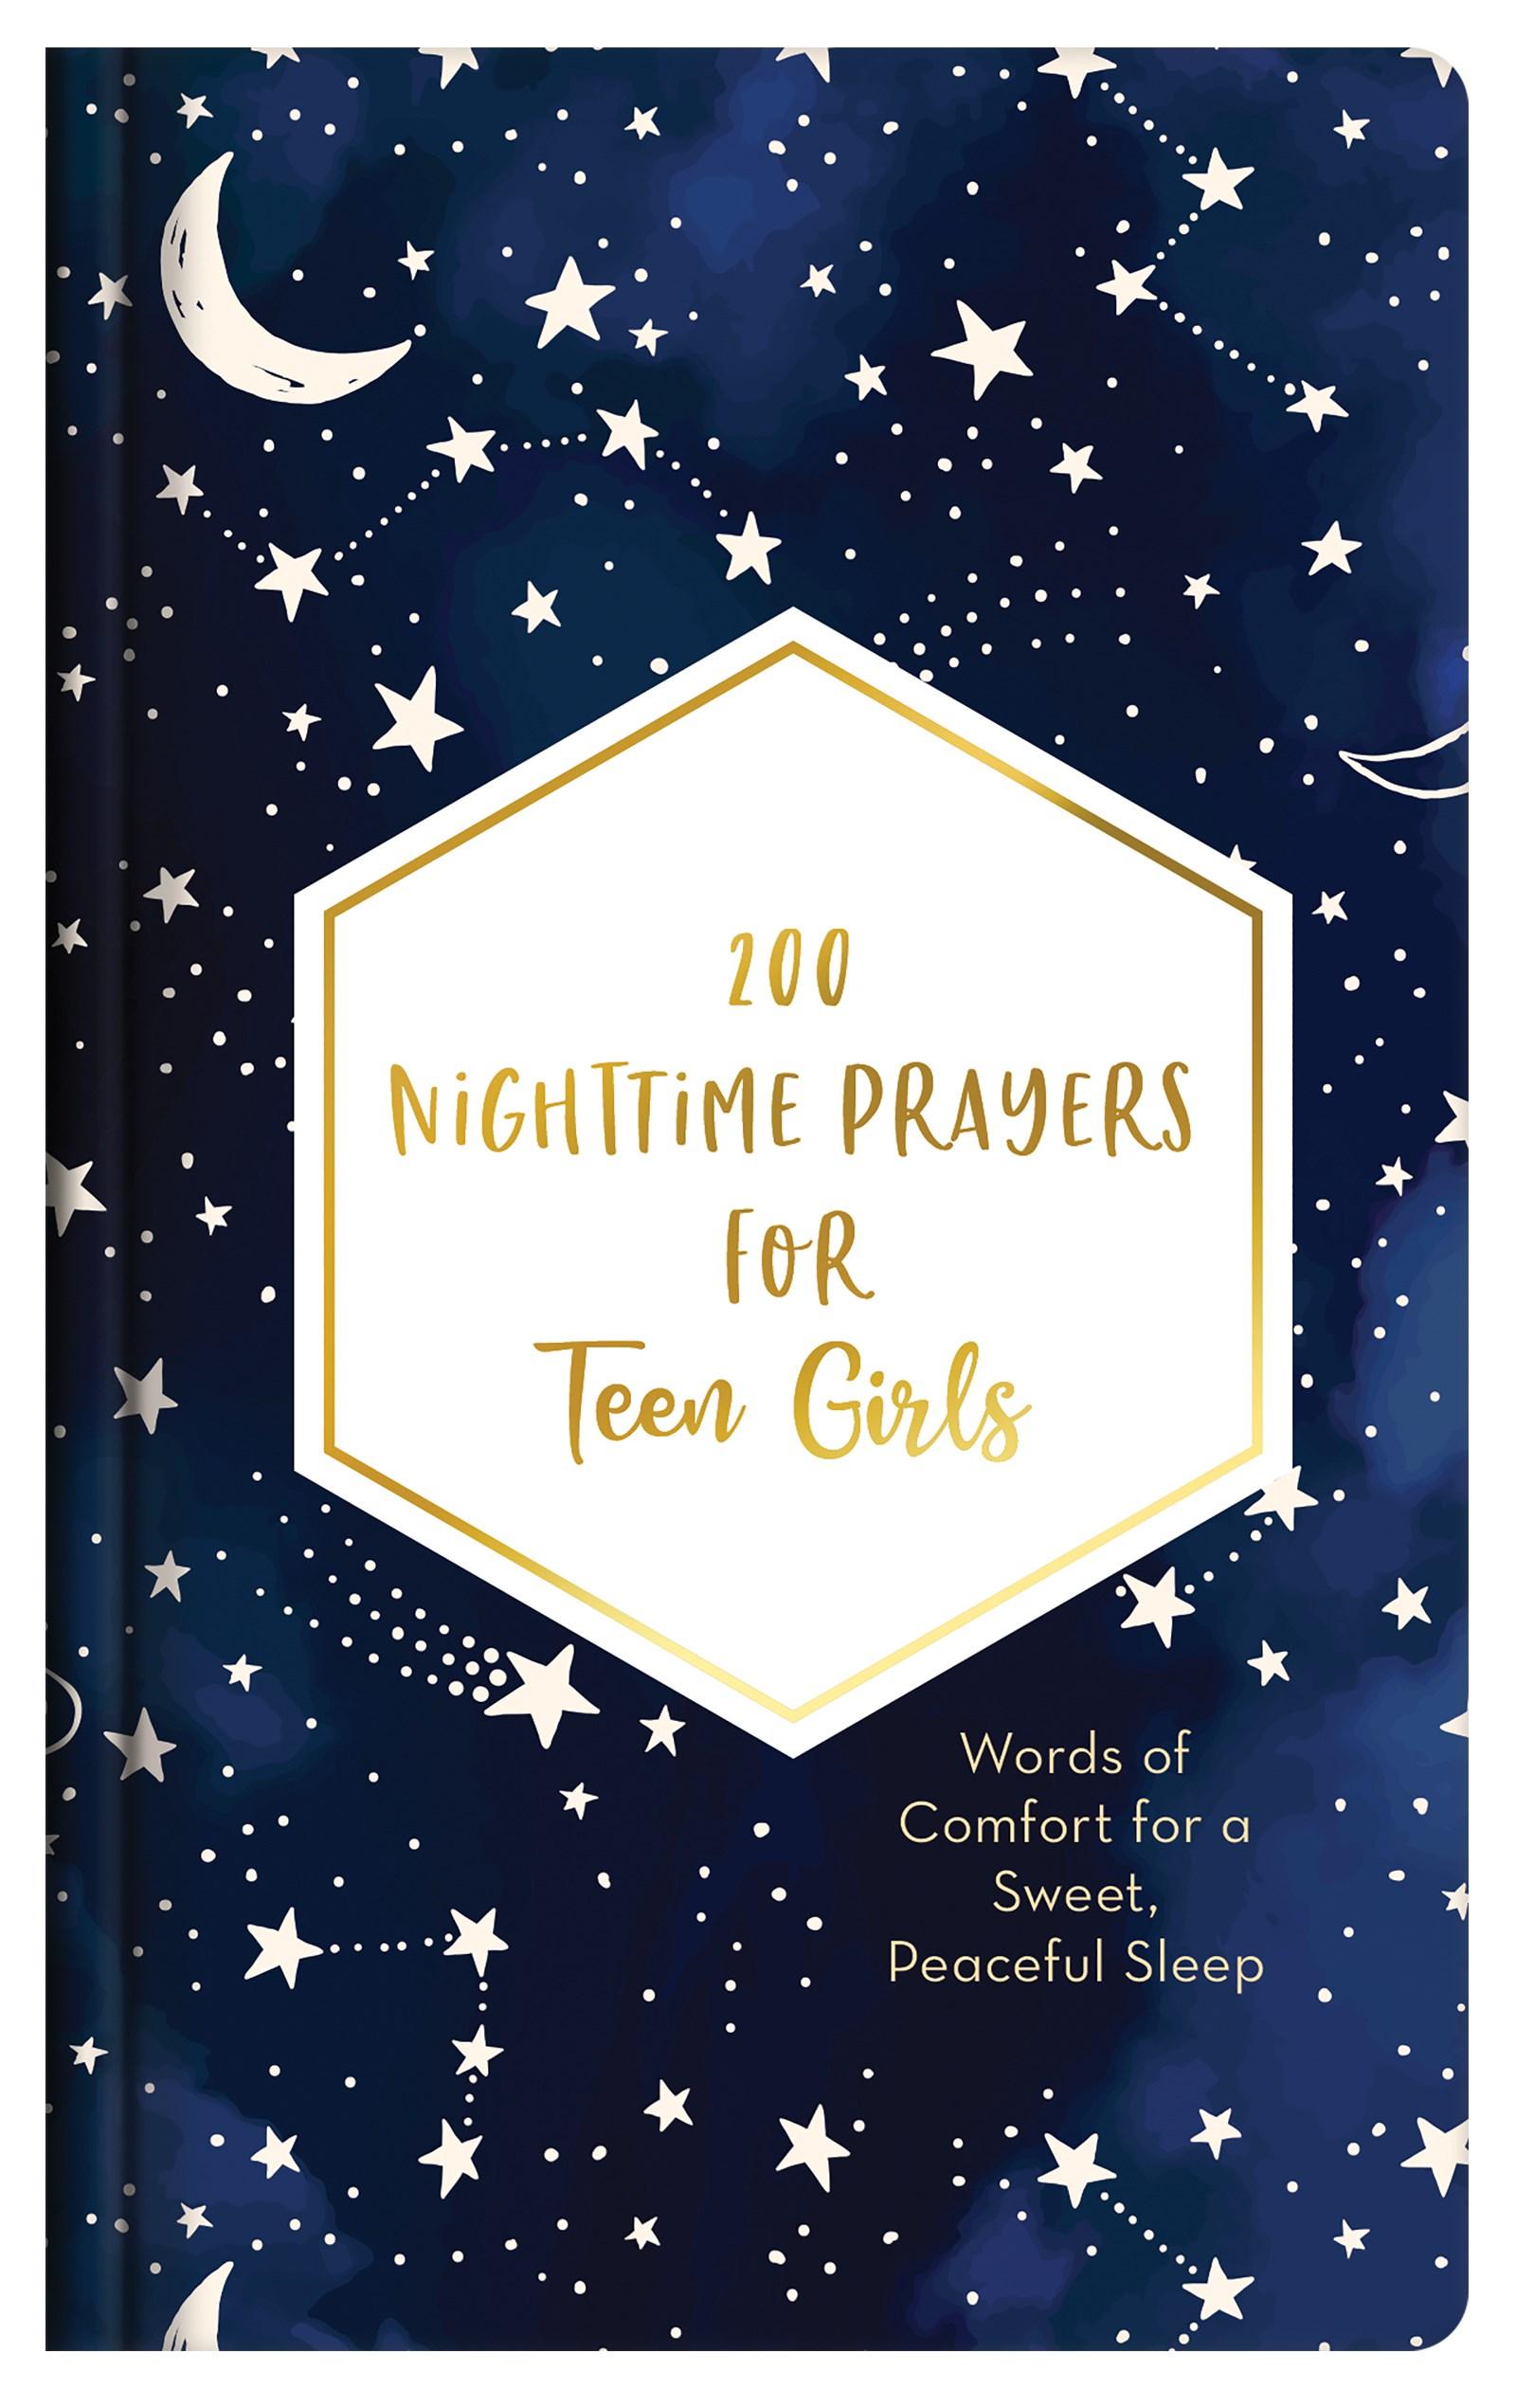 200 Nighttime Prayers For Teen Girls